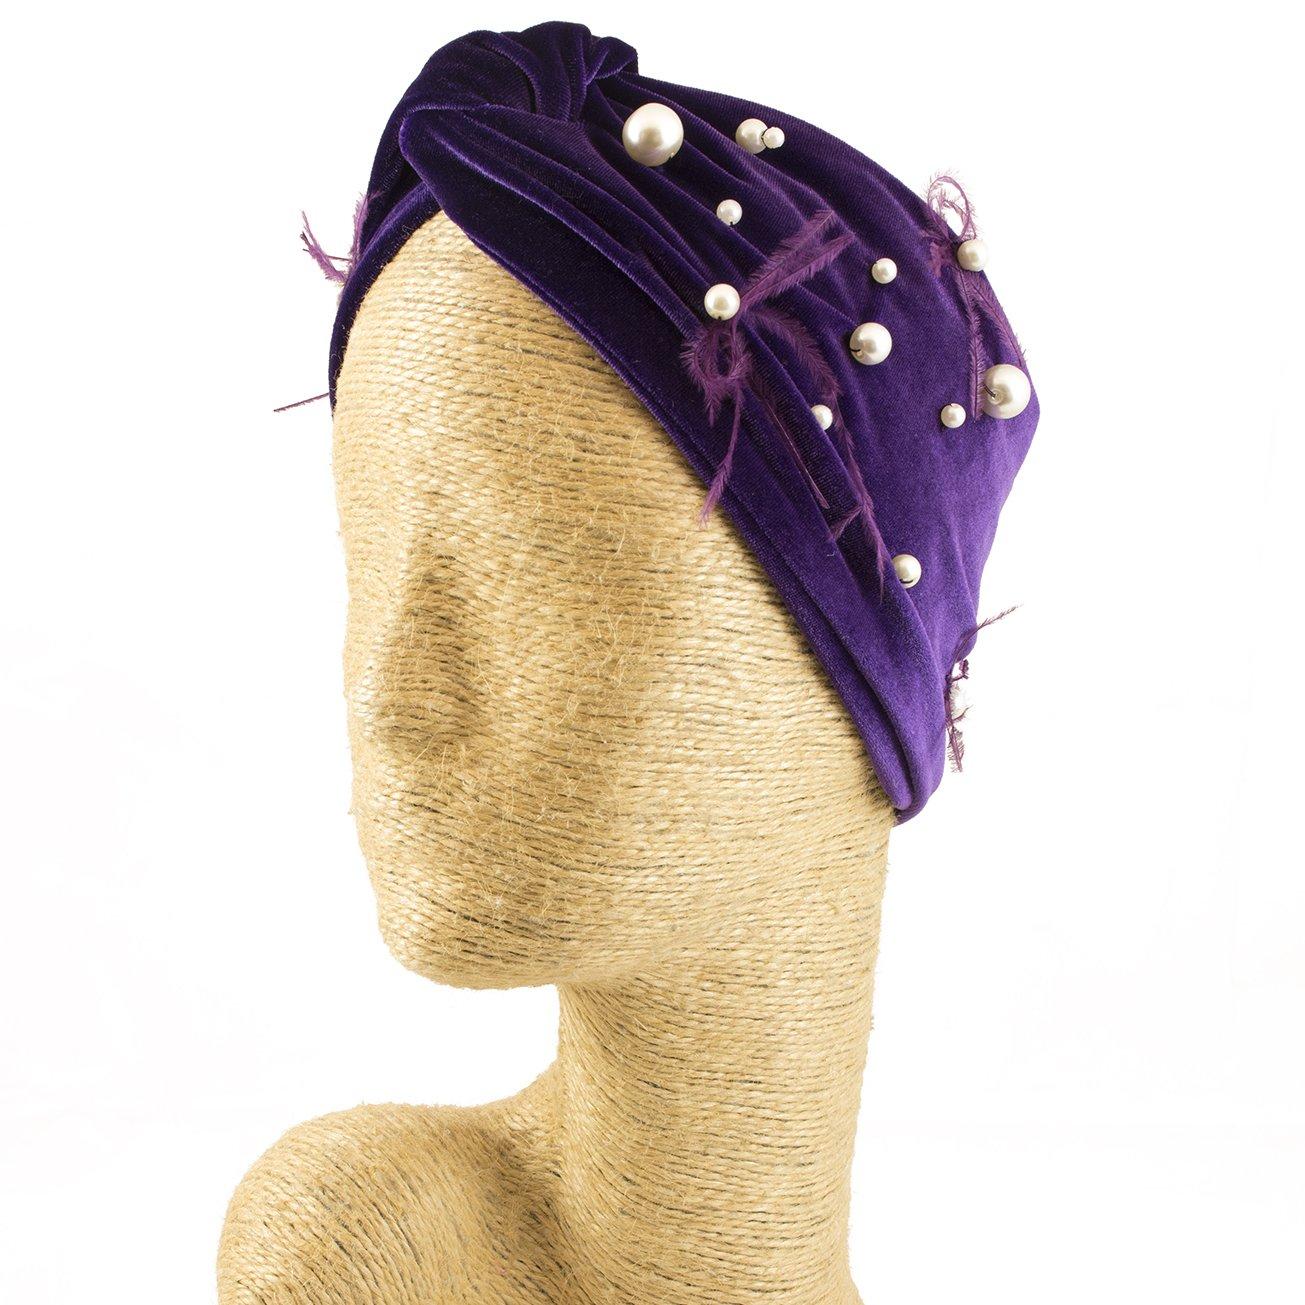 Fascinator, Velvet Headbands, Millinery, Worldwide Free Shipment, Delivery in 2 Days, Customized Tailoring, Designer Fashion, Pearl, Head wrap, Boho Accessories, Purple, Beaded Headbands, Jewelled